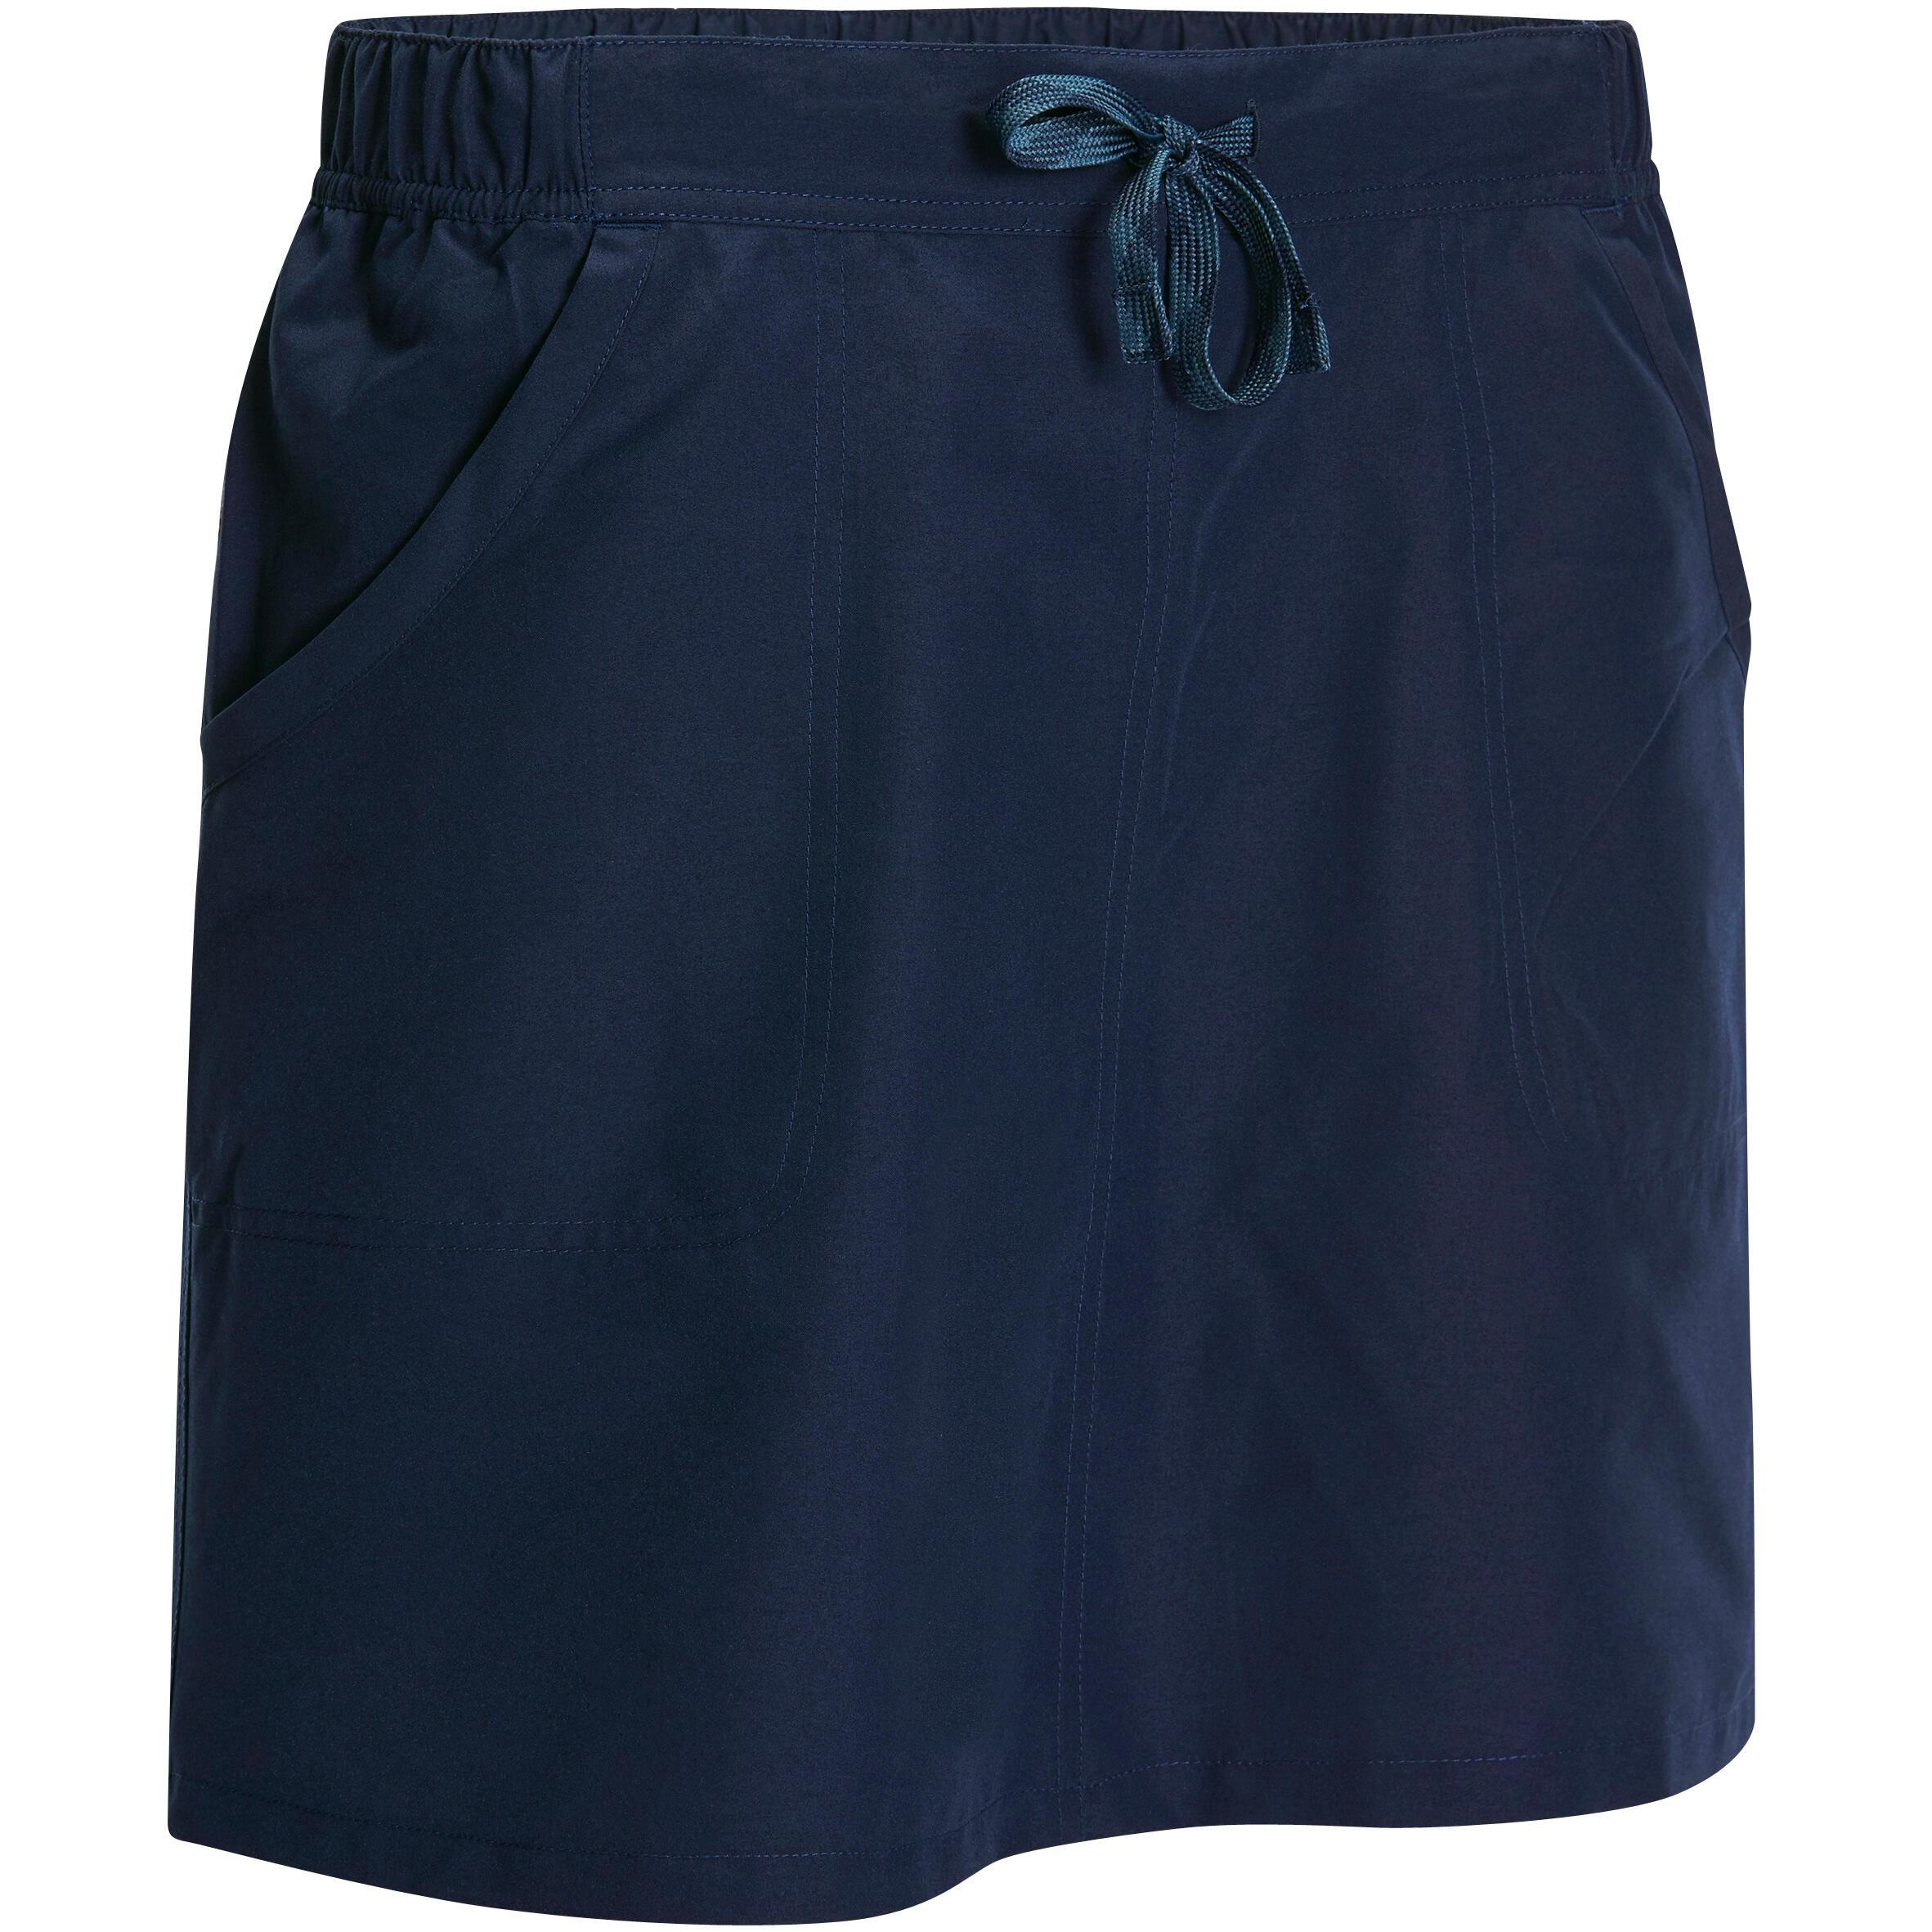 Falda-short travesía naturaleza mujer Arpenaz 50 azul marino